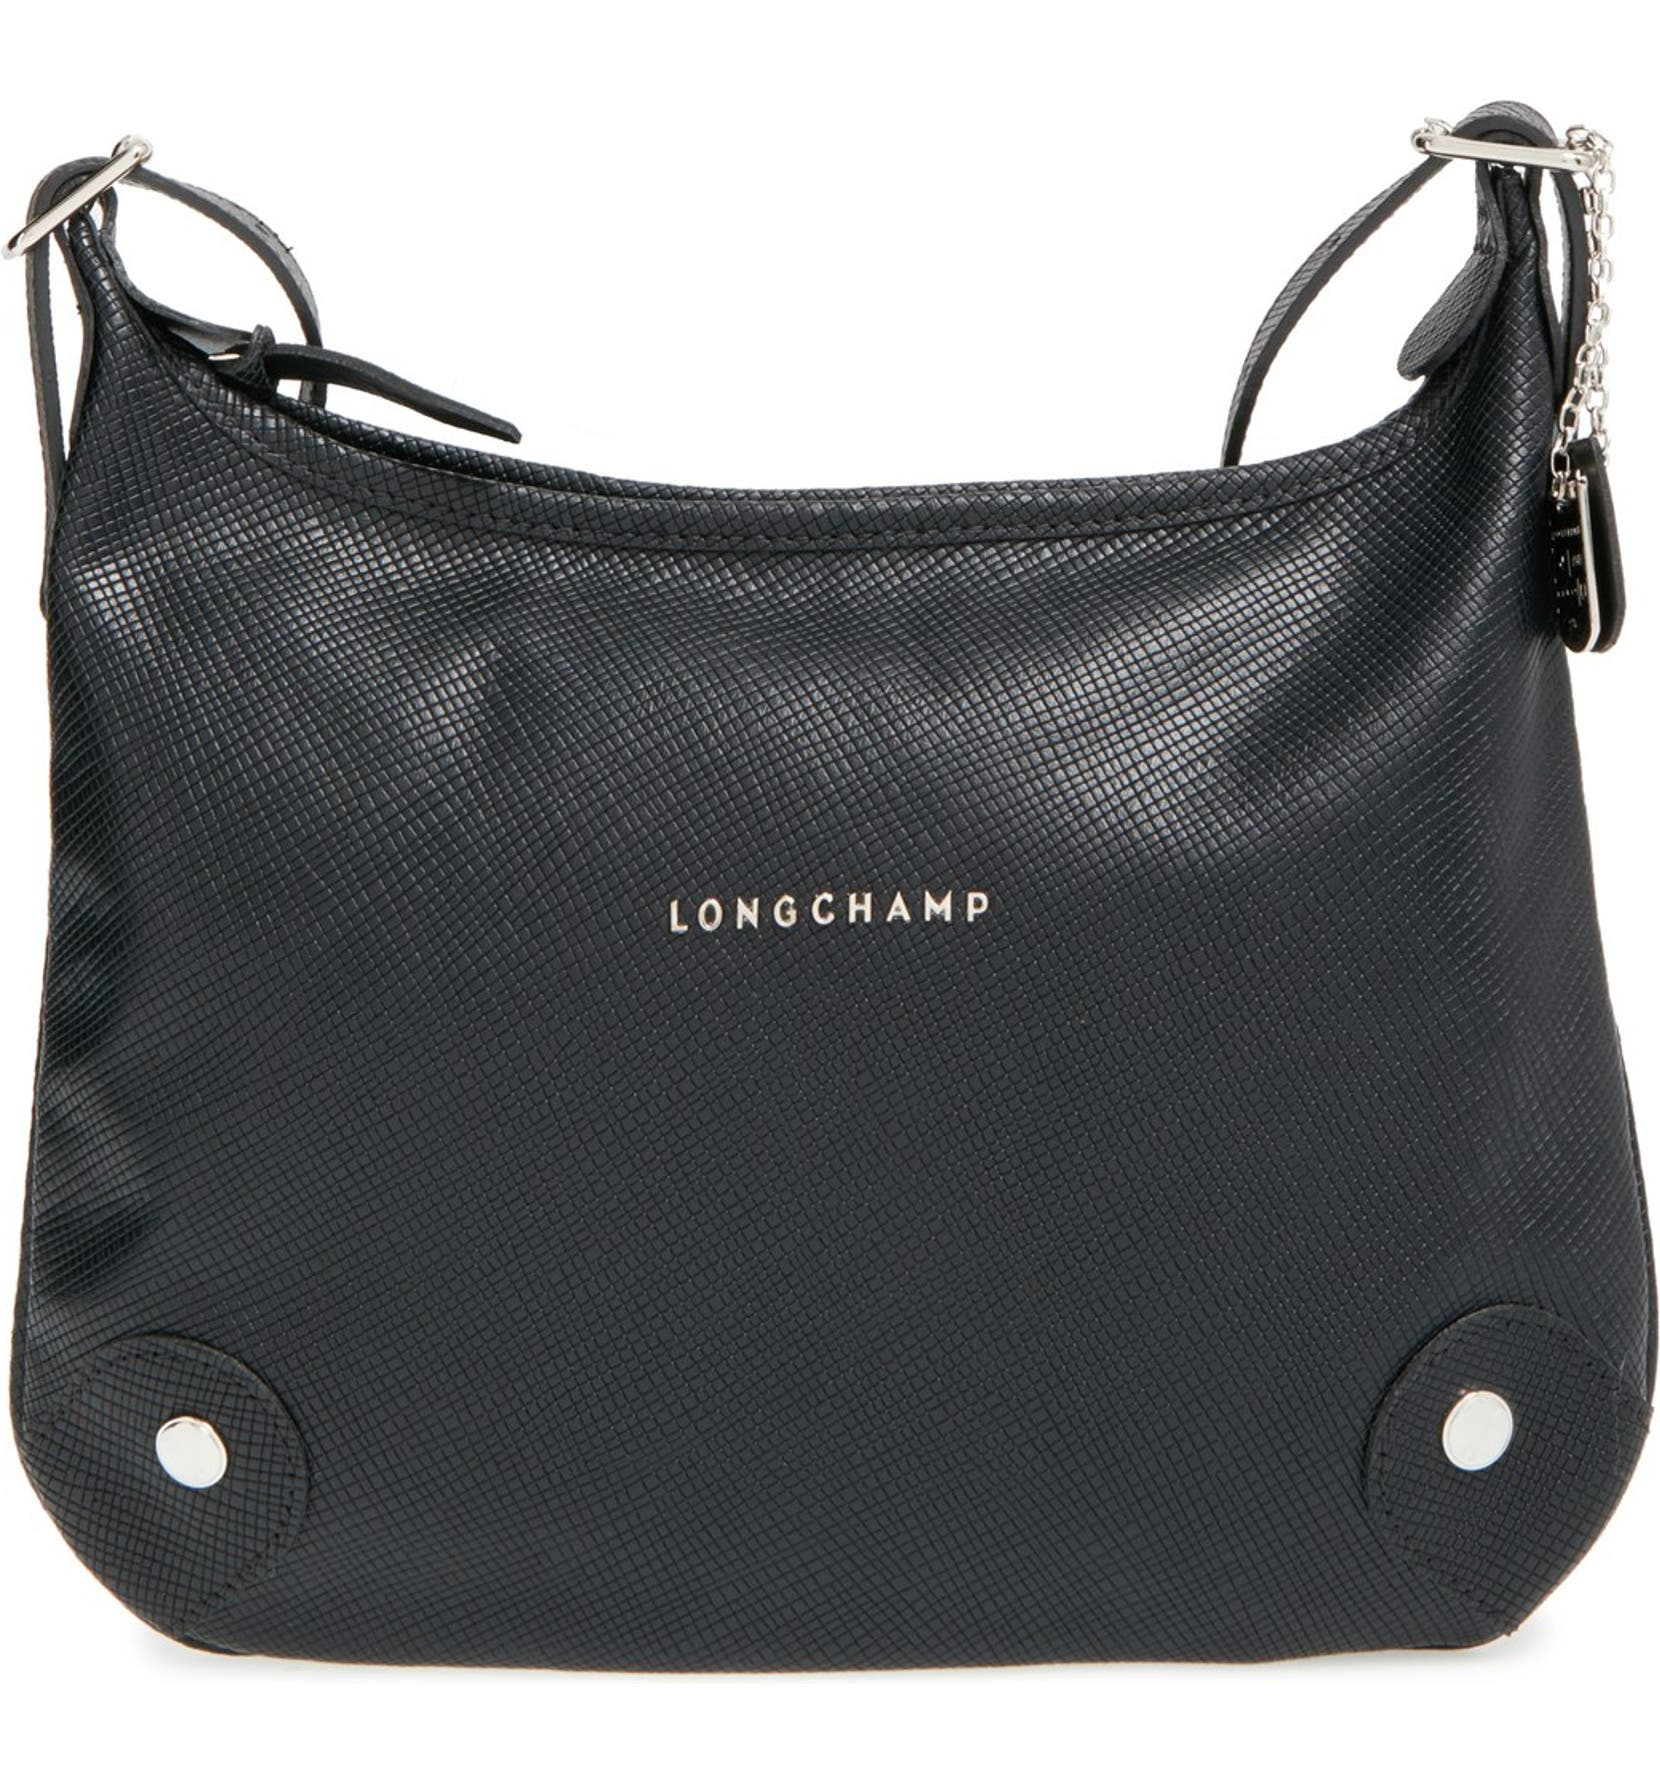 Longchamp Quadri Leather Crossbody Bag Nordstrom Quadry